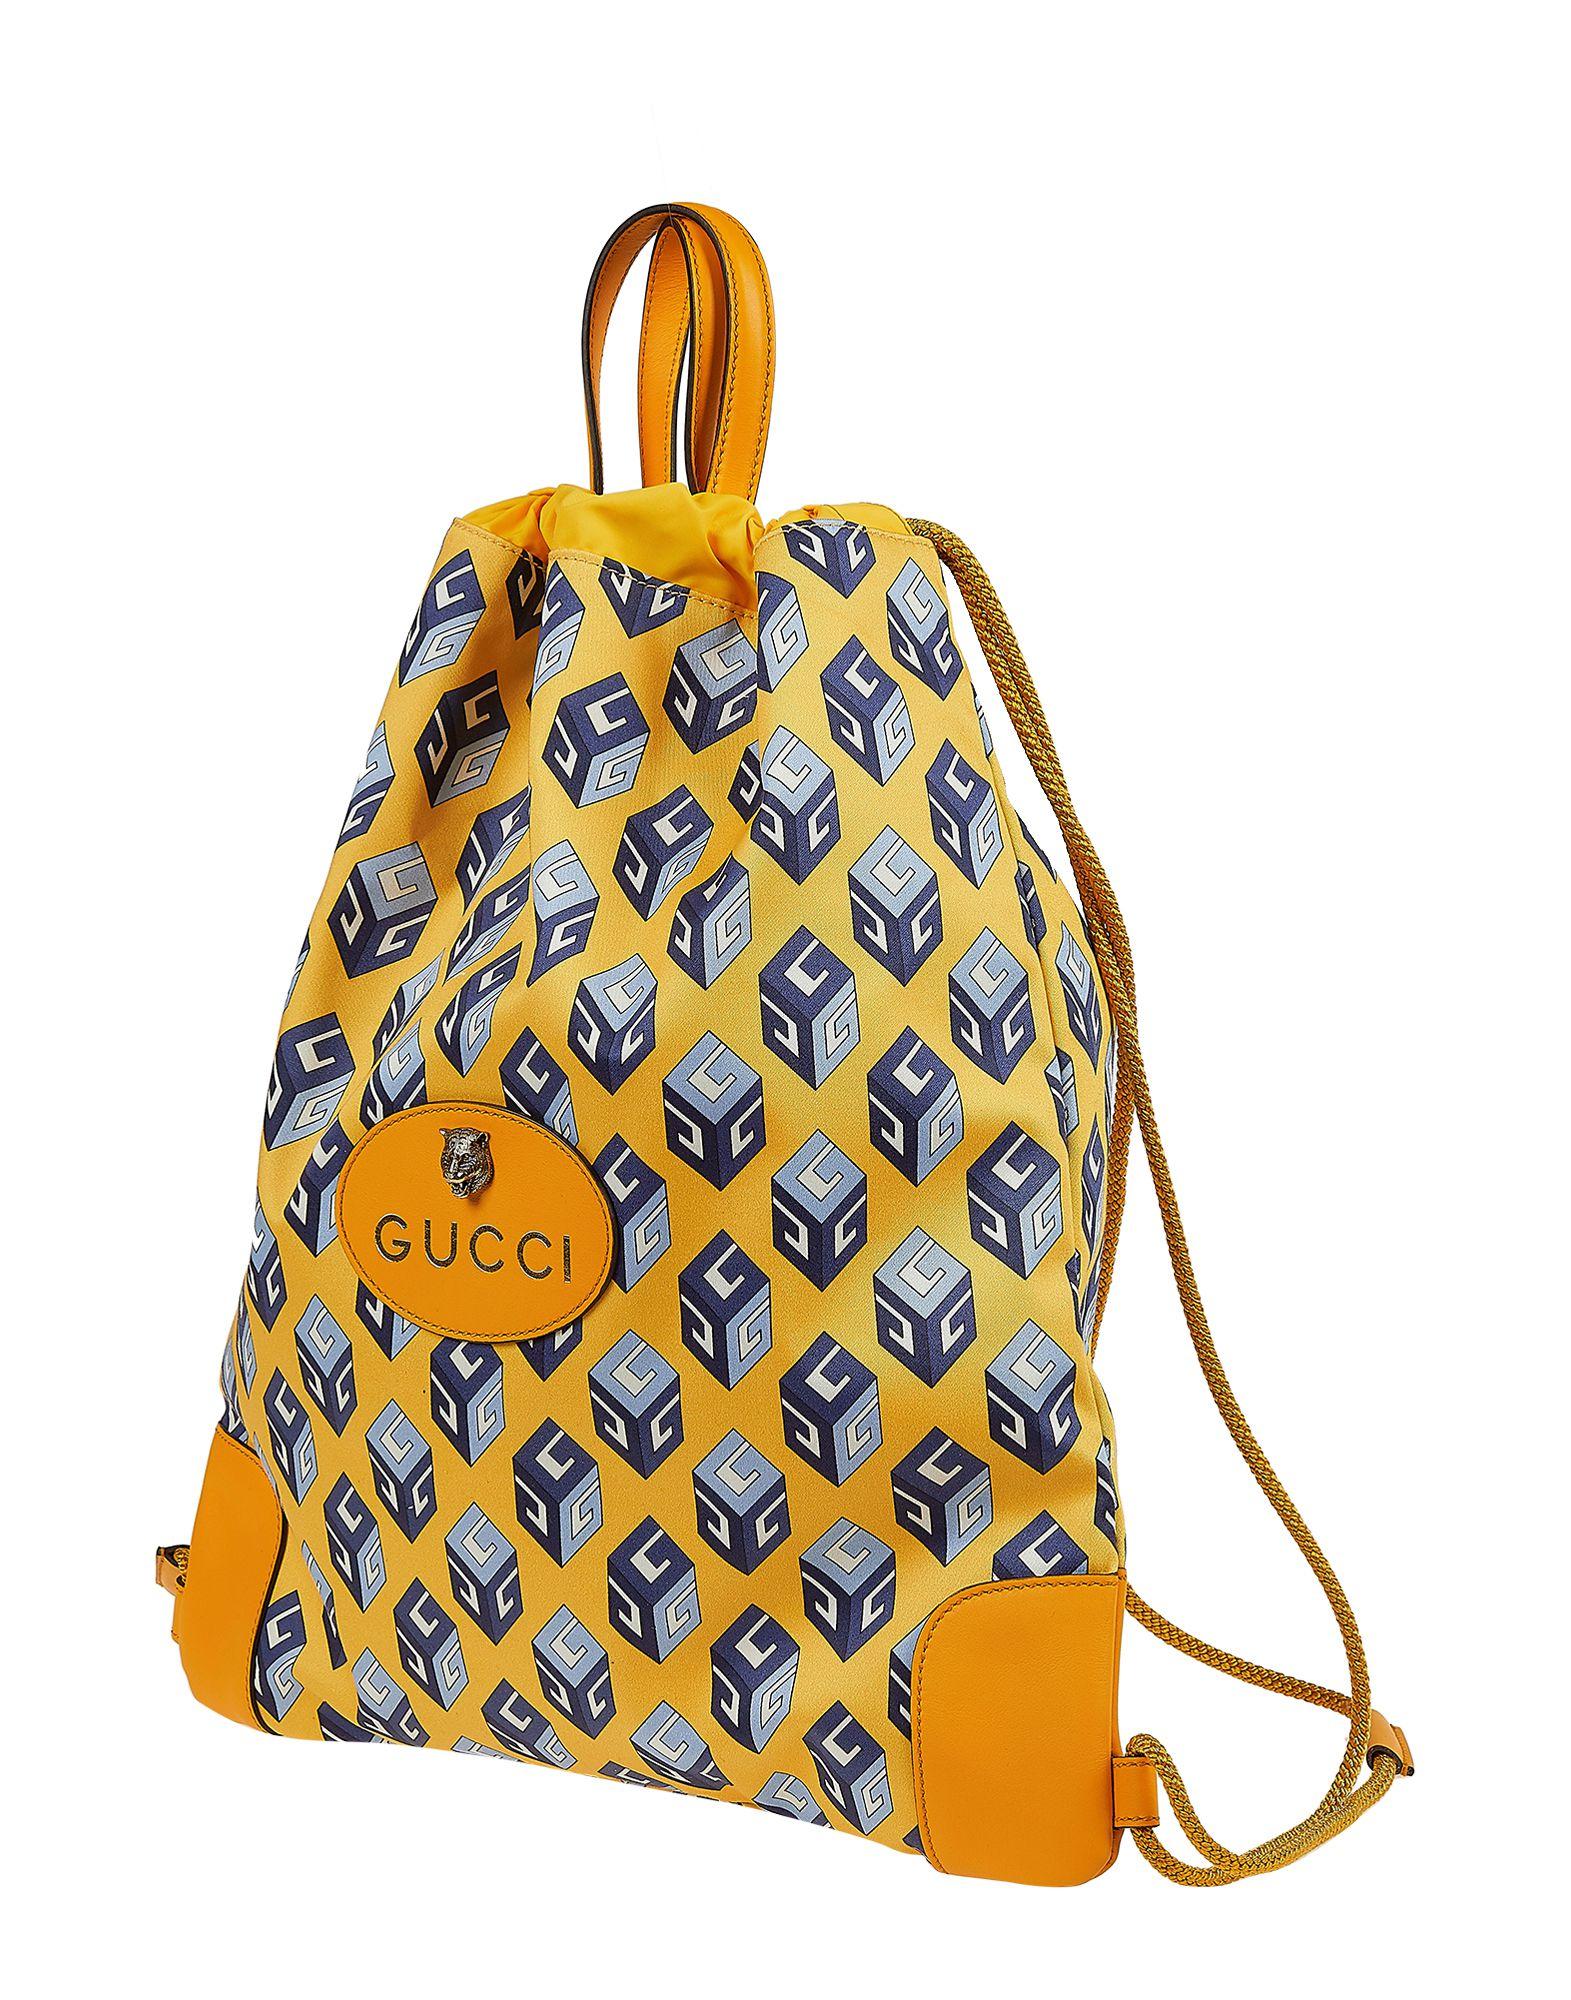 GUCCI Backpacks & Fanny packs. maxi, metal applications, logo, drawstring closure, internal pockets, bag handle, fully lined, multicolor pattern, contains non-textile parts of animal origin. Cotton, Calfskin